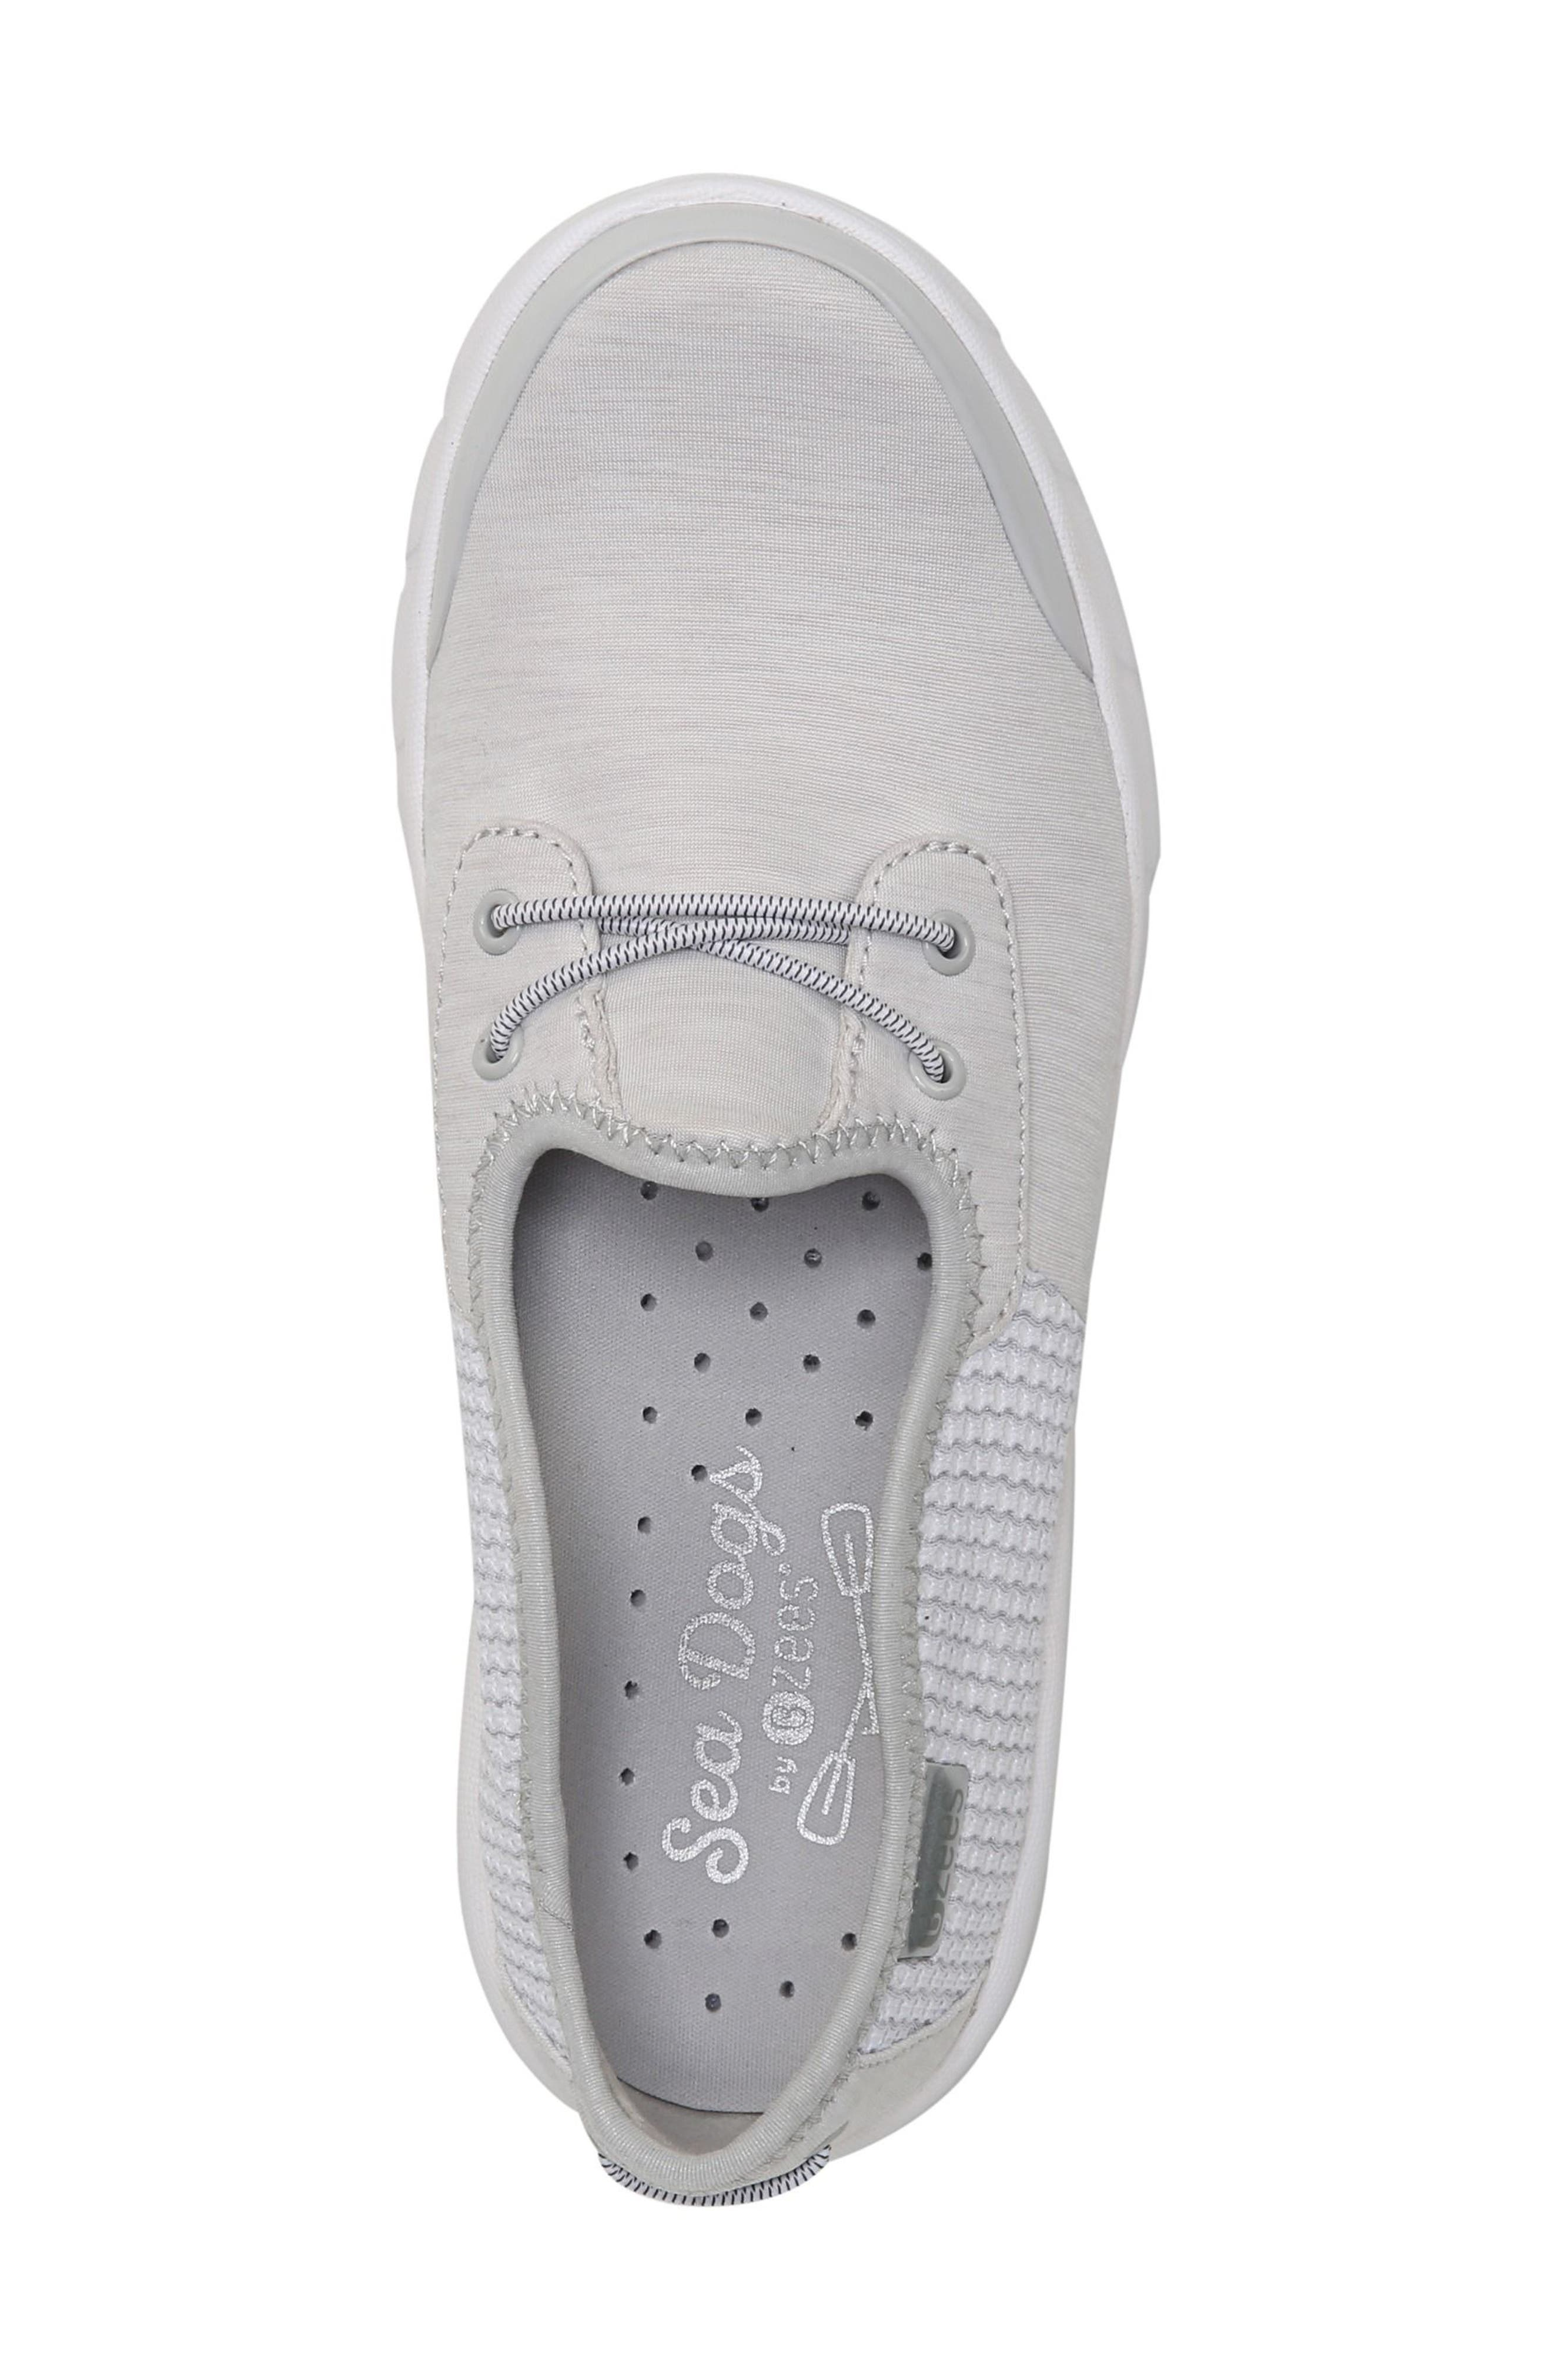 Oz Slip-On Sneaker,                             Alternate thumbnail 5, color,                             Grey Fabric